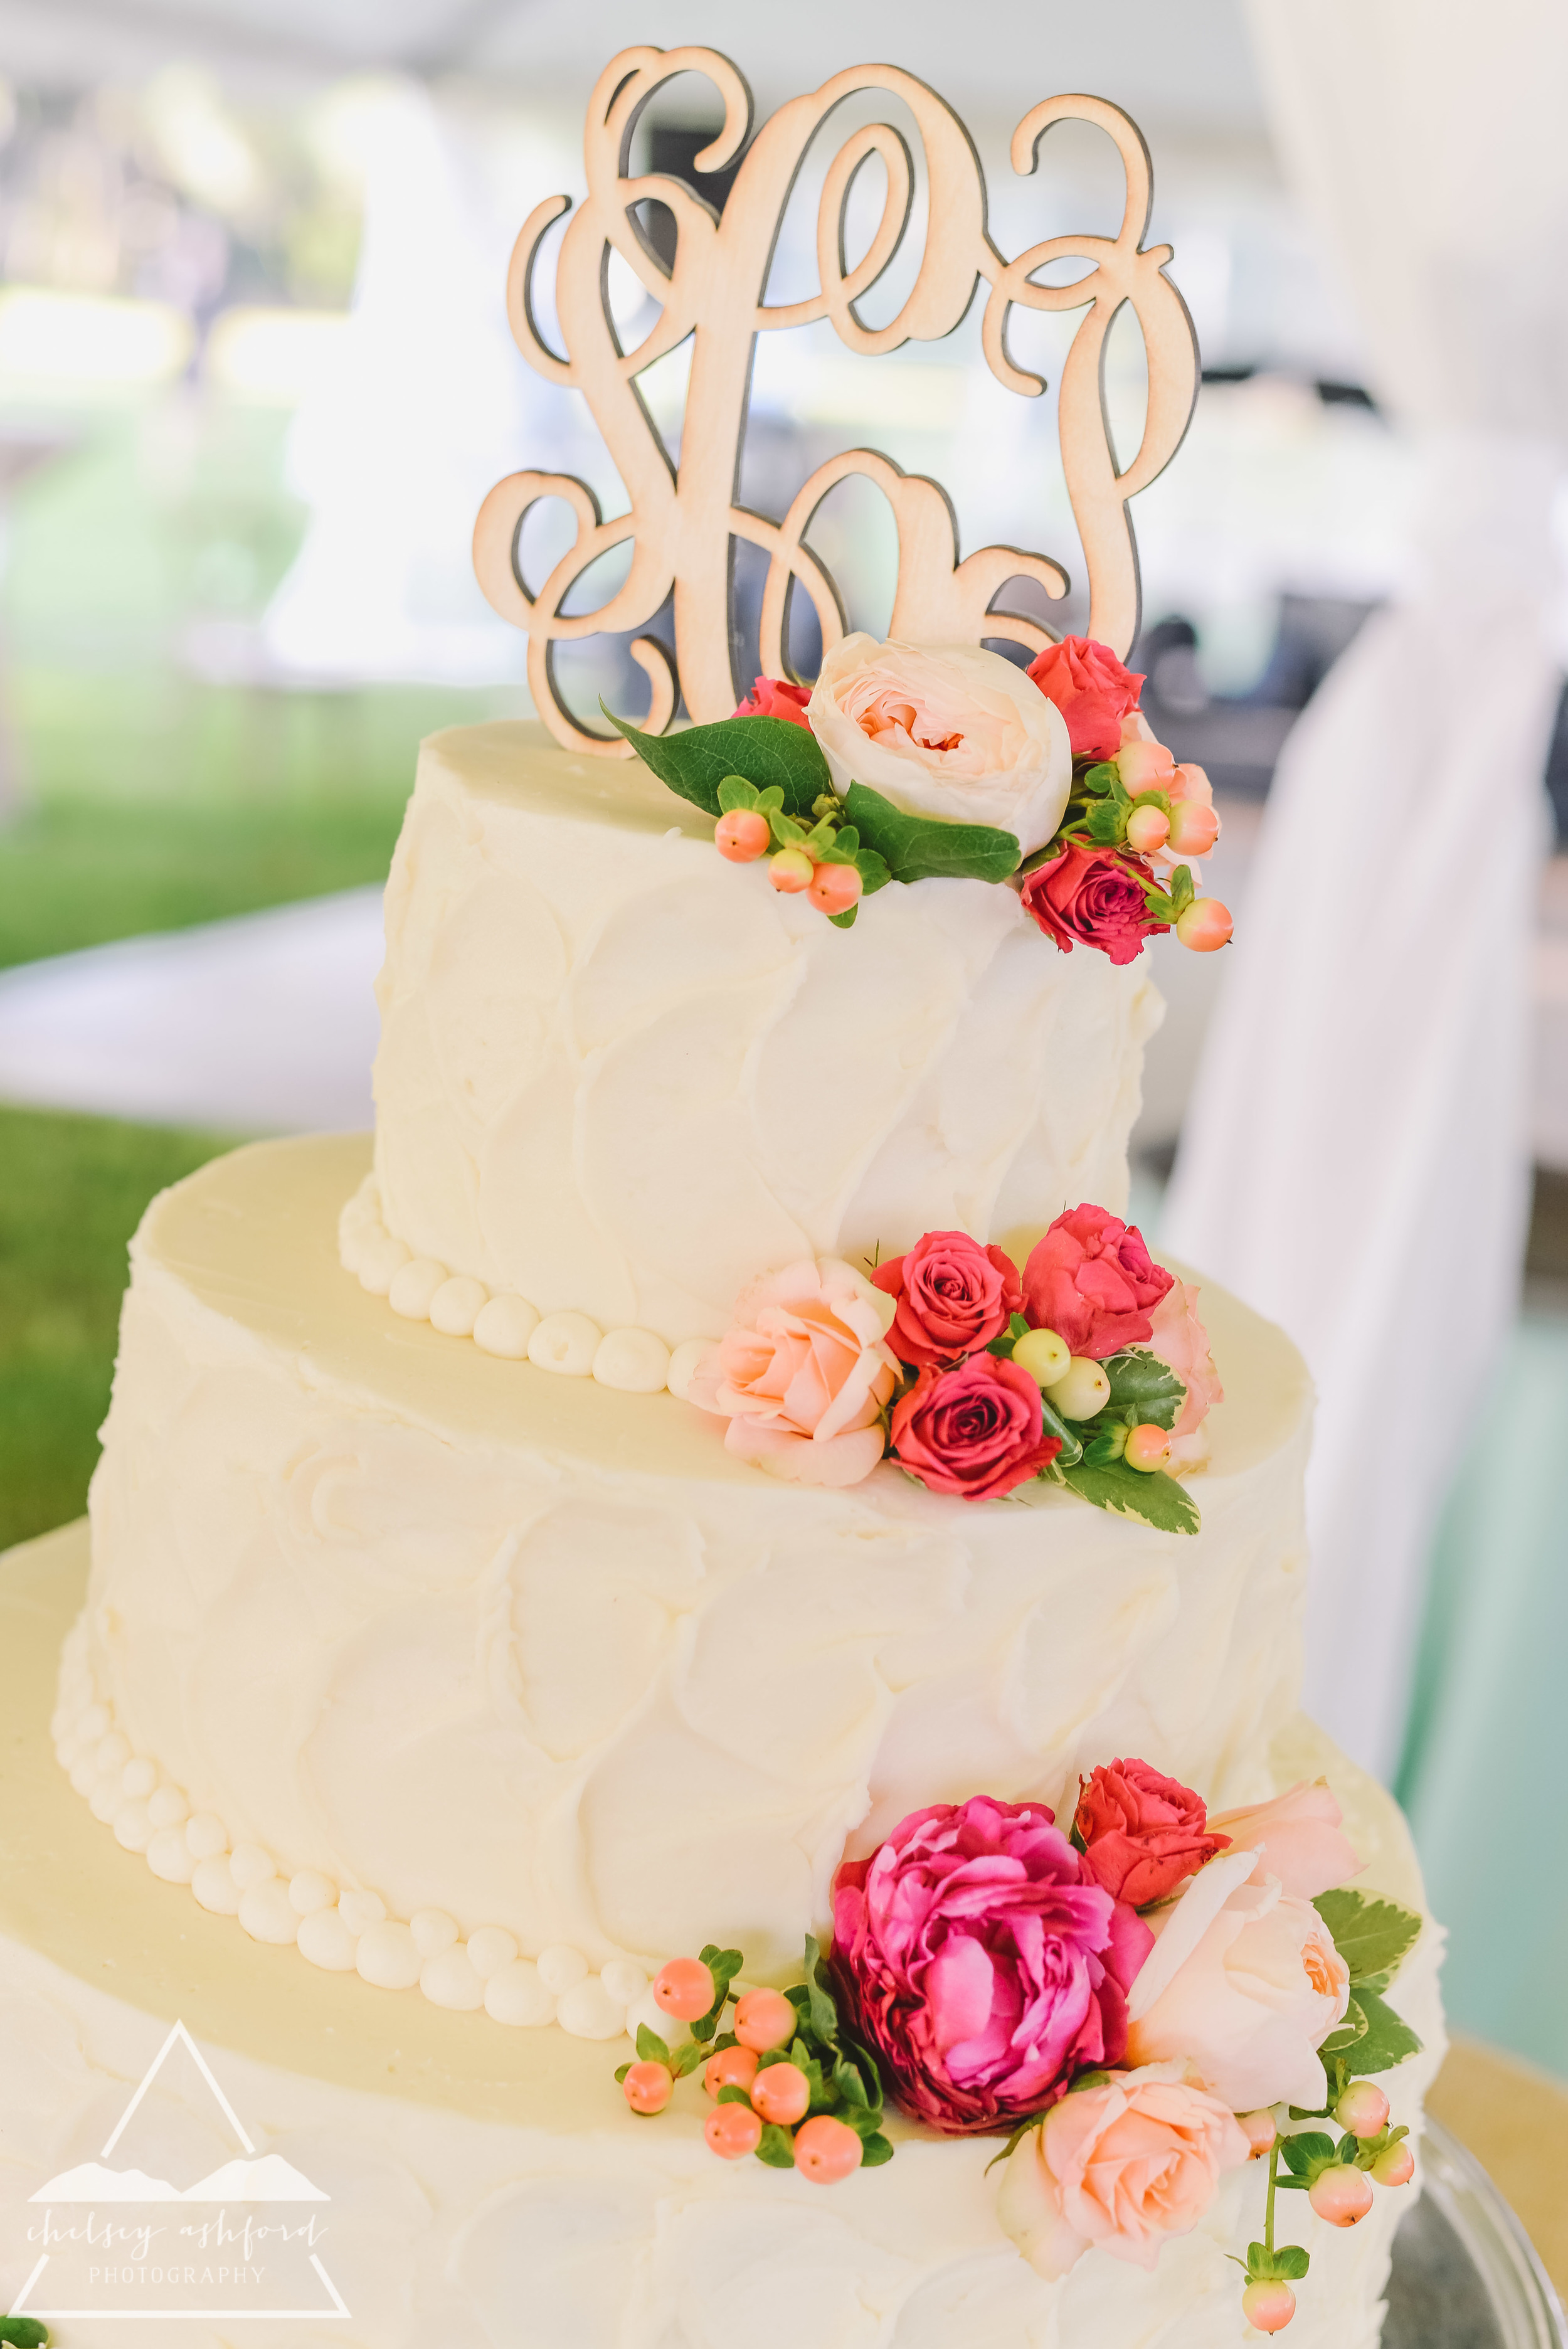 Clarkson_wedding_web-115.jpg